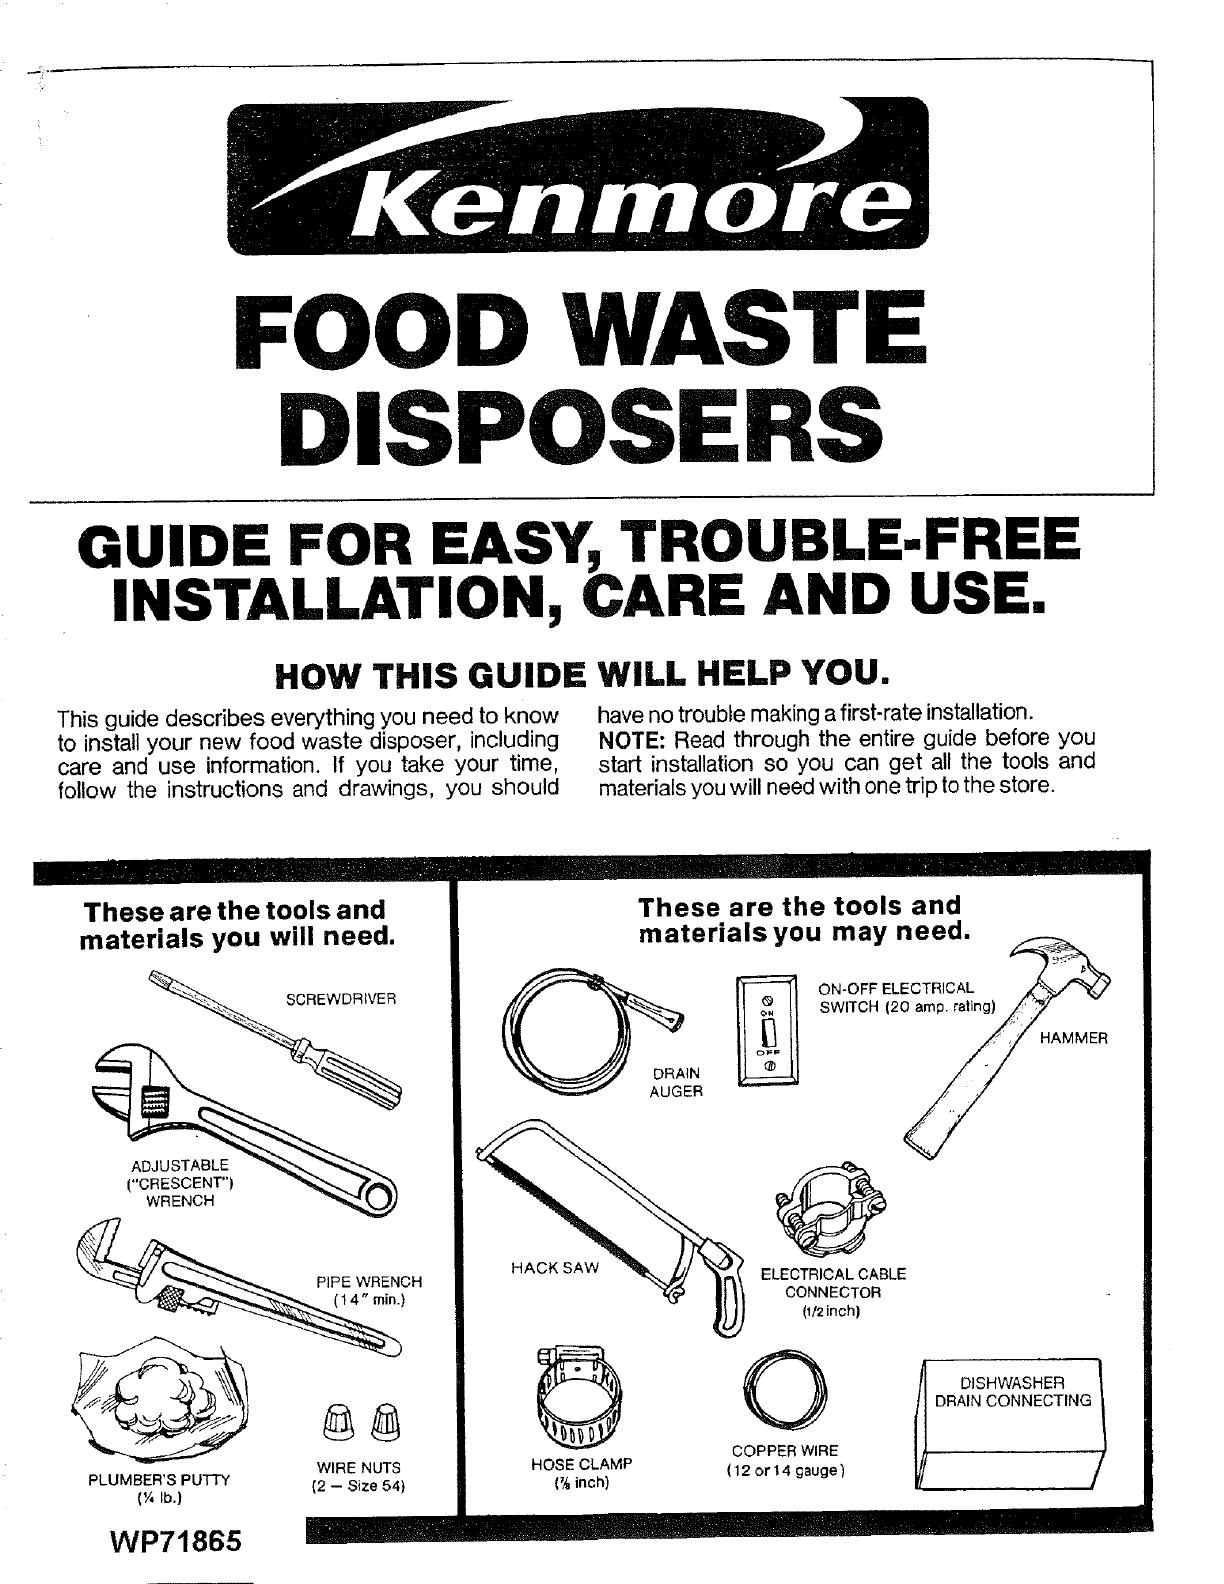 Kenmore 17560514 User Manual Disposer In Sink Erator Manuals And Guides L0712592